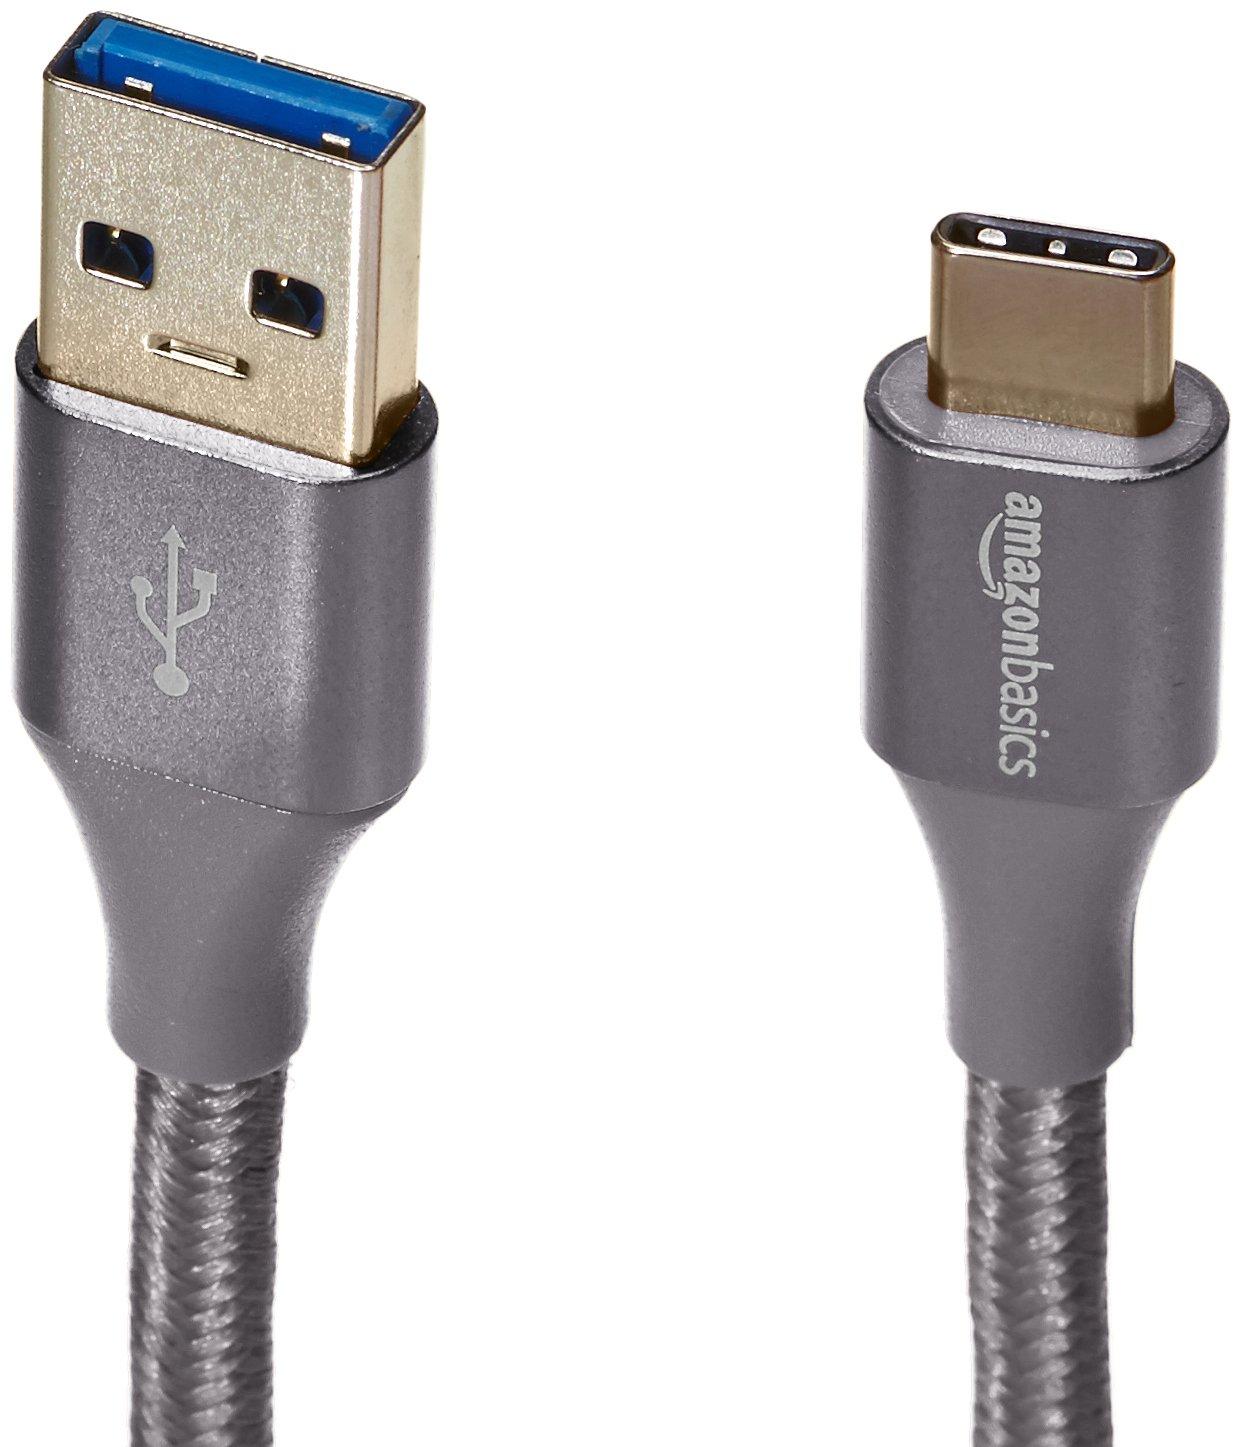 AmazonBasics Double Braided Nylon USB Type-C to Type-A 3.1 Gen 2 Cable   1 feet, Dark Grey by AmazonBasics (Image #5)